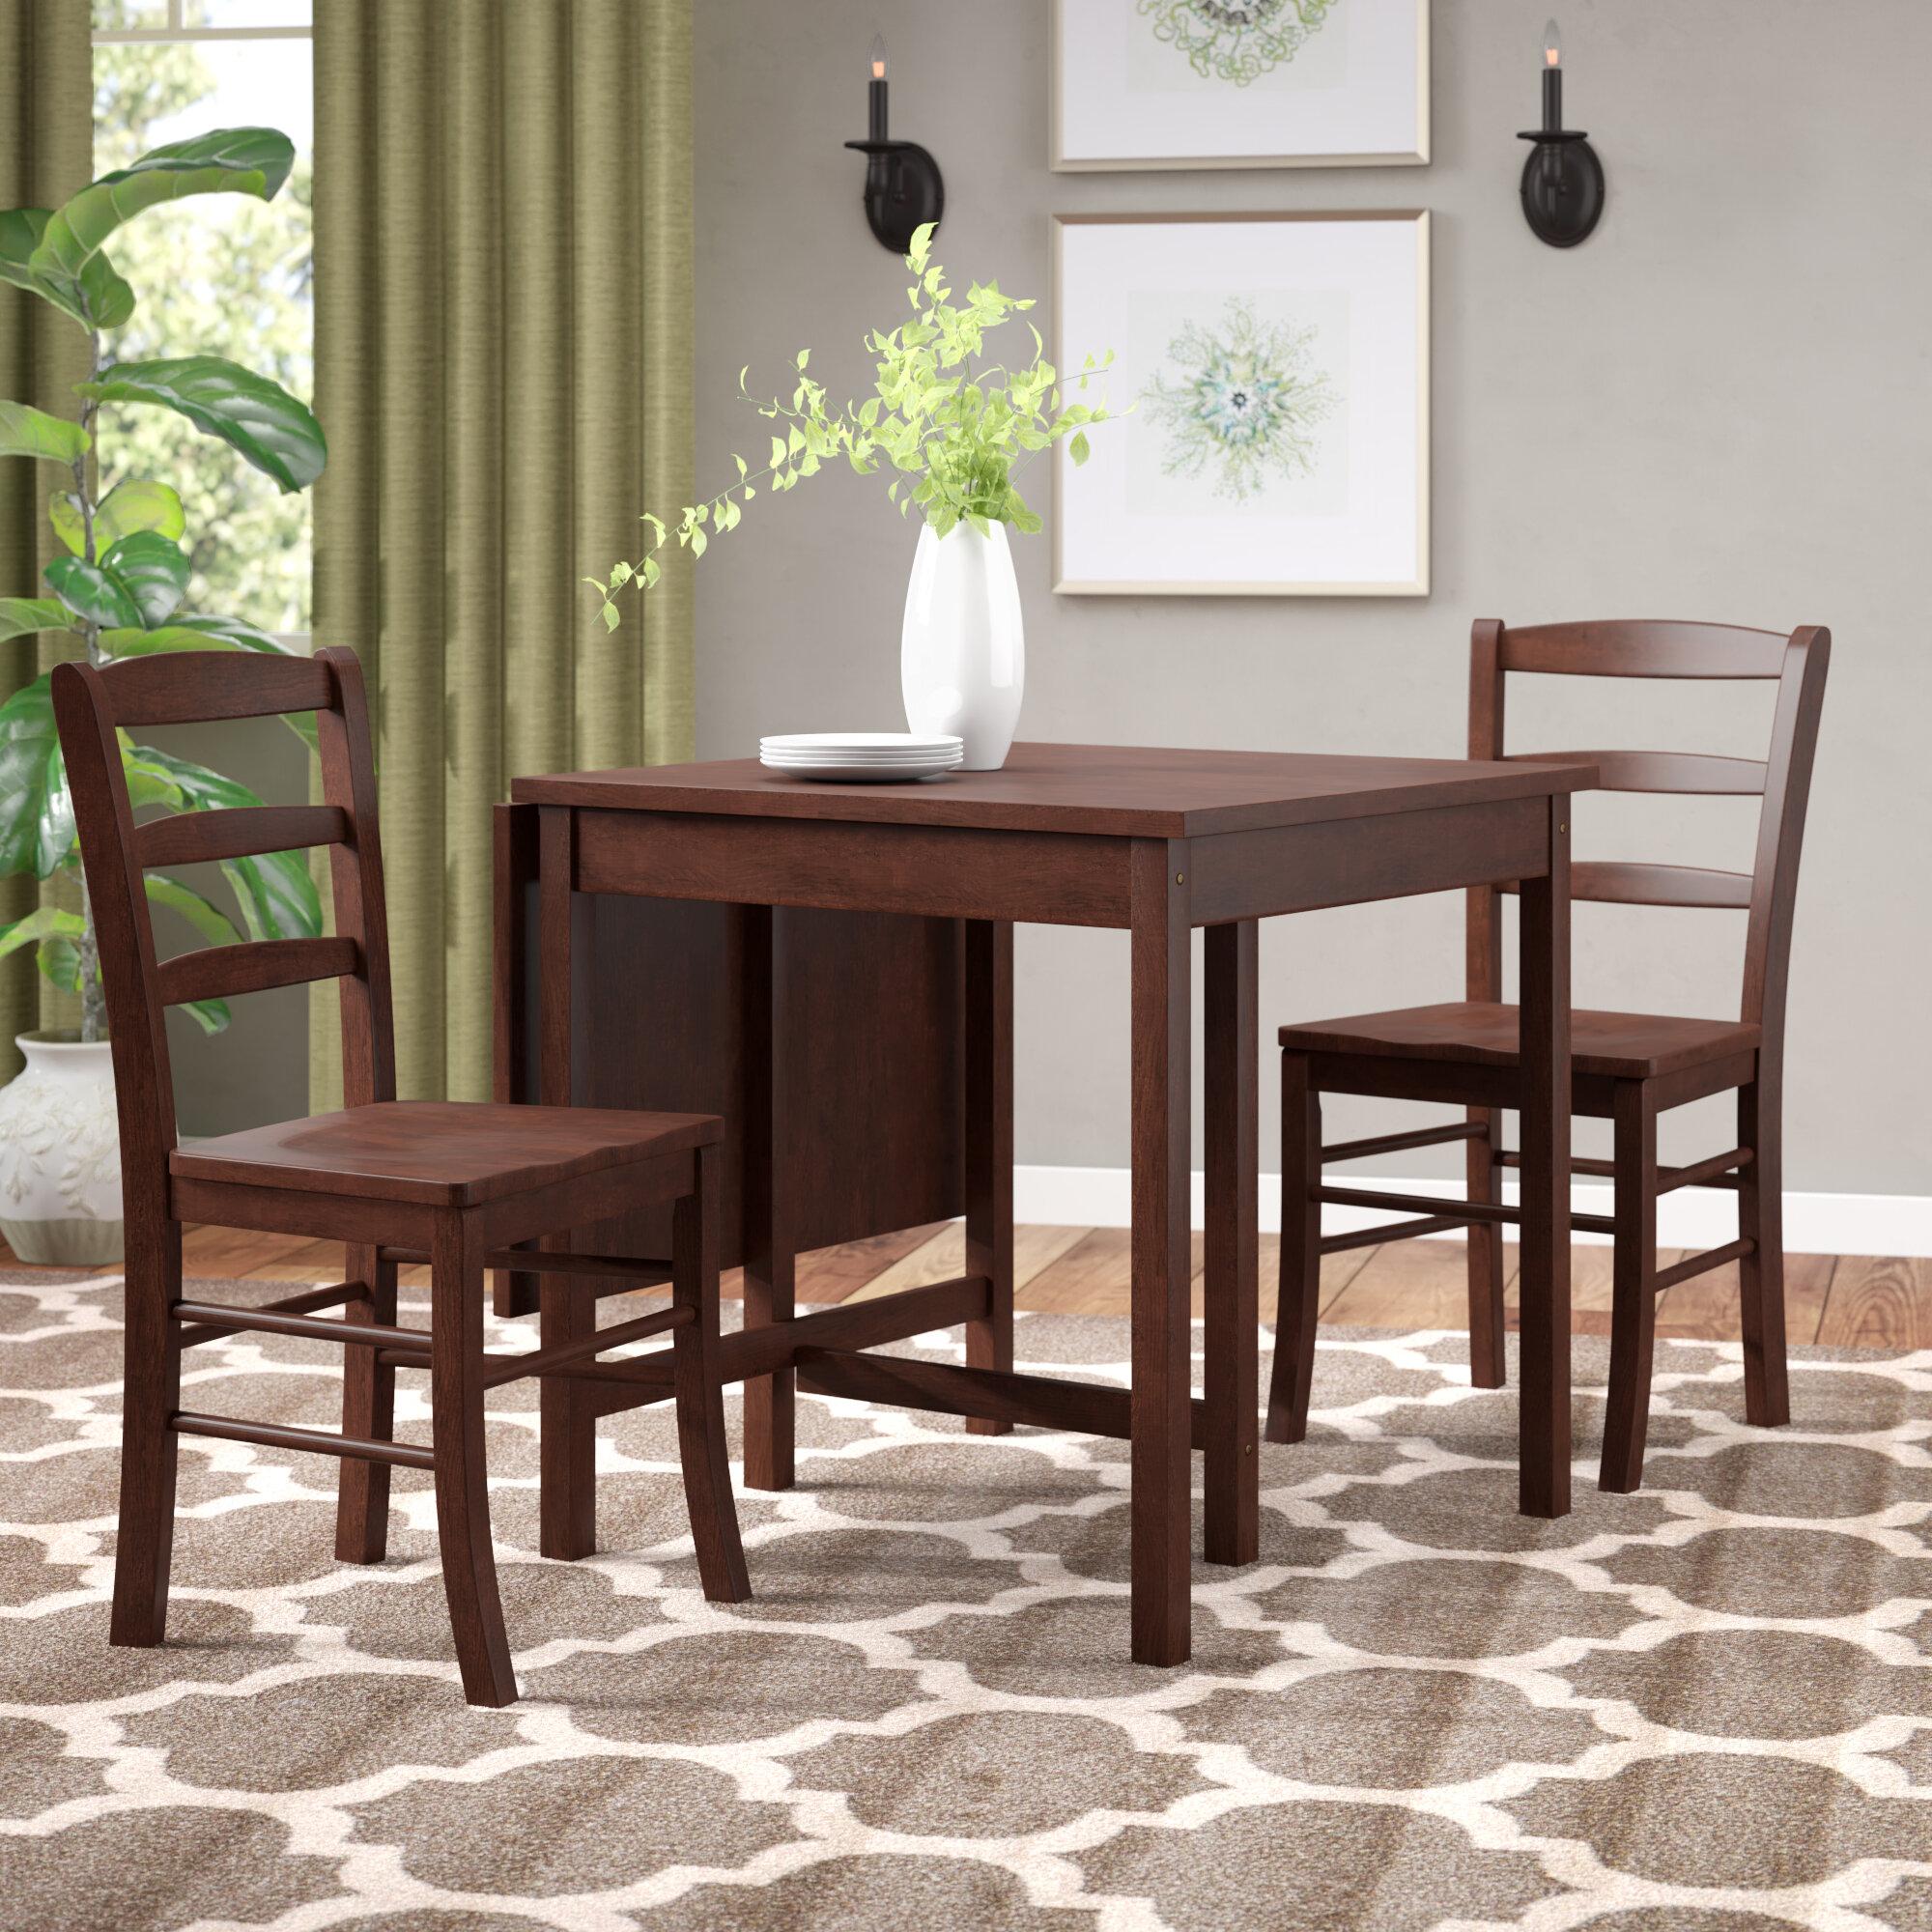 Red Barrel Studio Torrance Piece Drop Leaf Dining Set Reviews - Torrance dining table